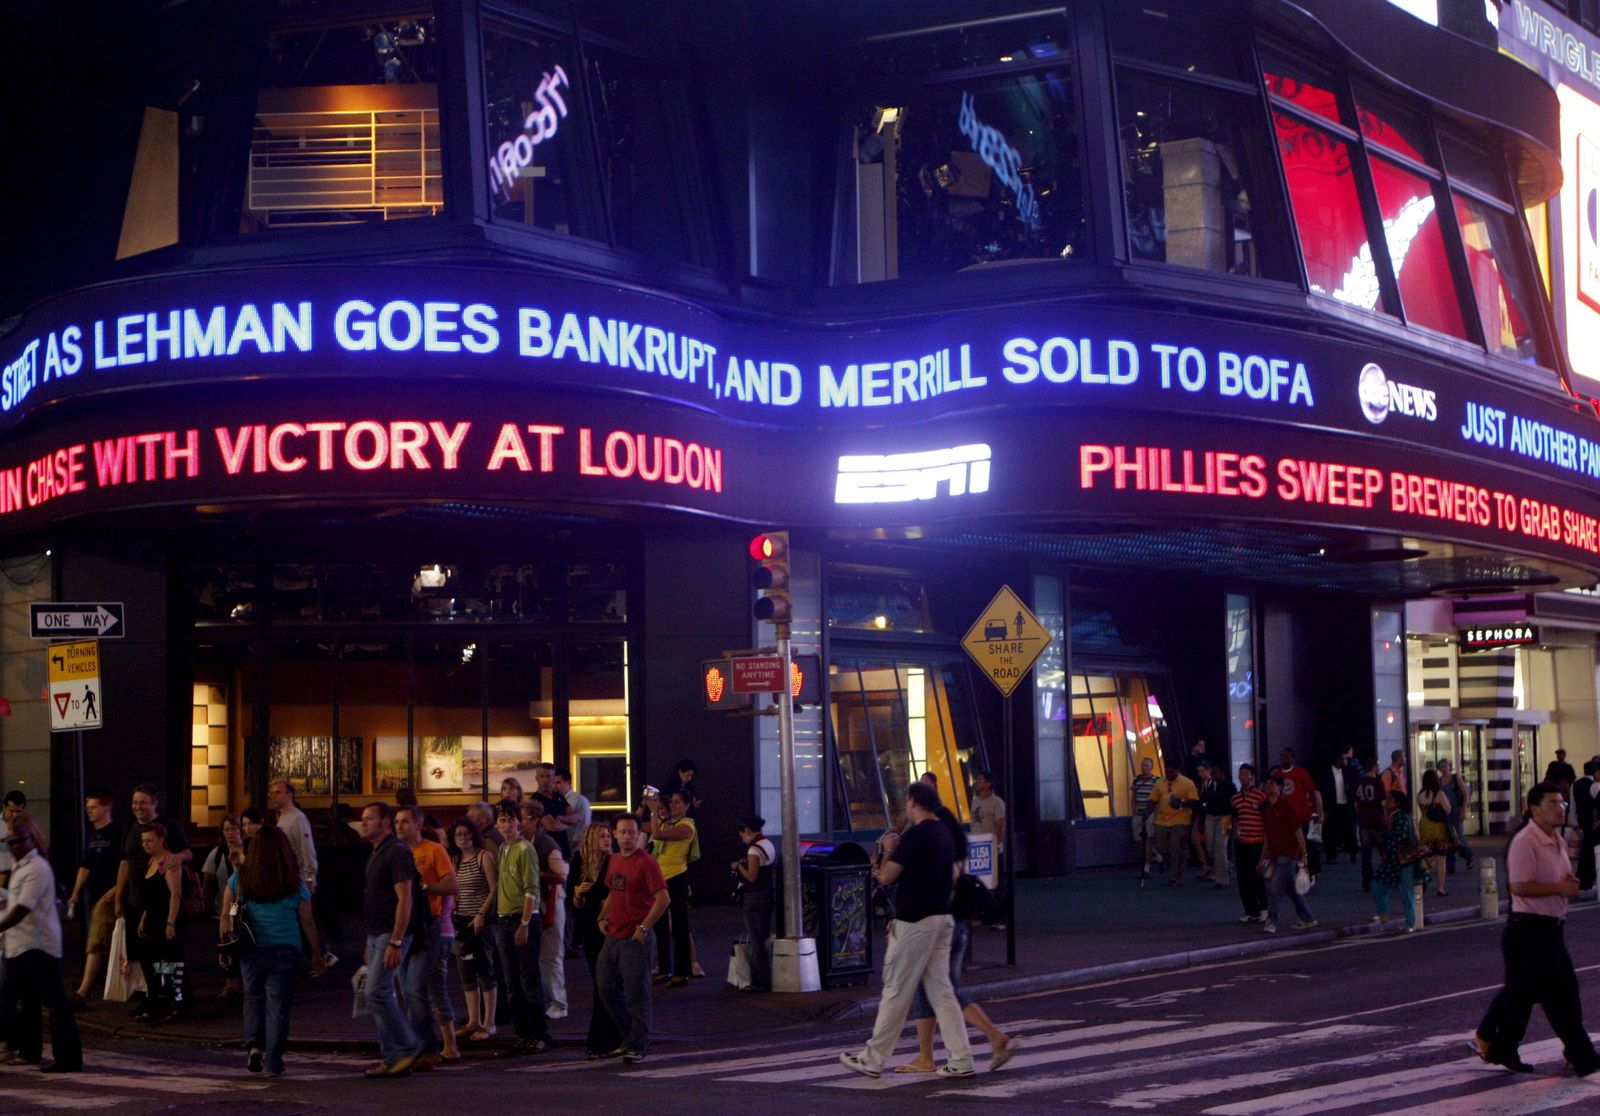 Börsencrash / Lehman Brothers